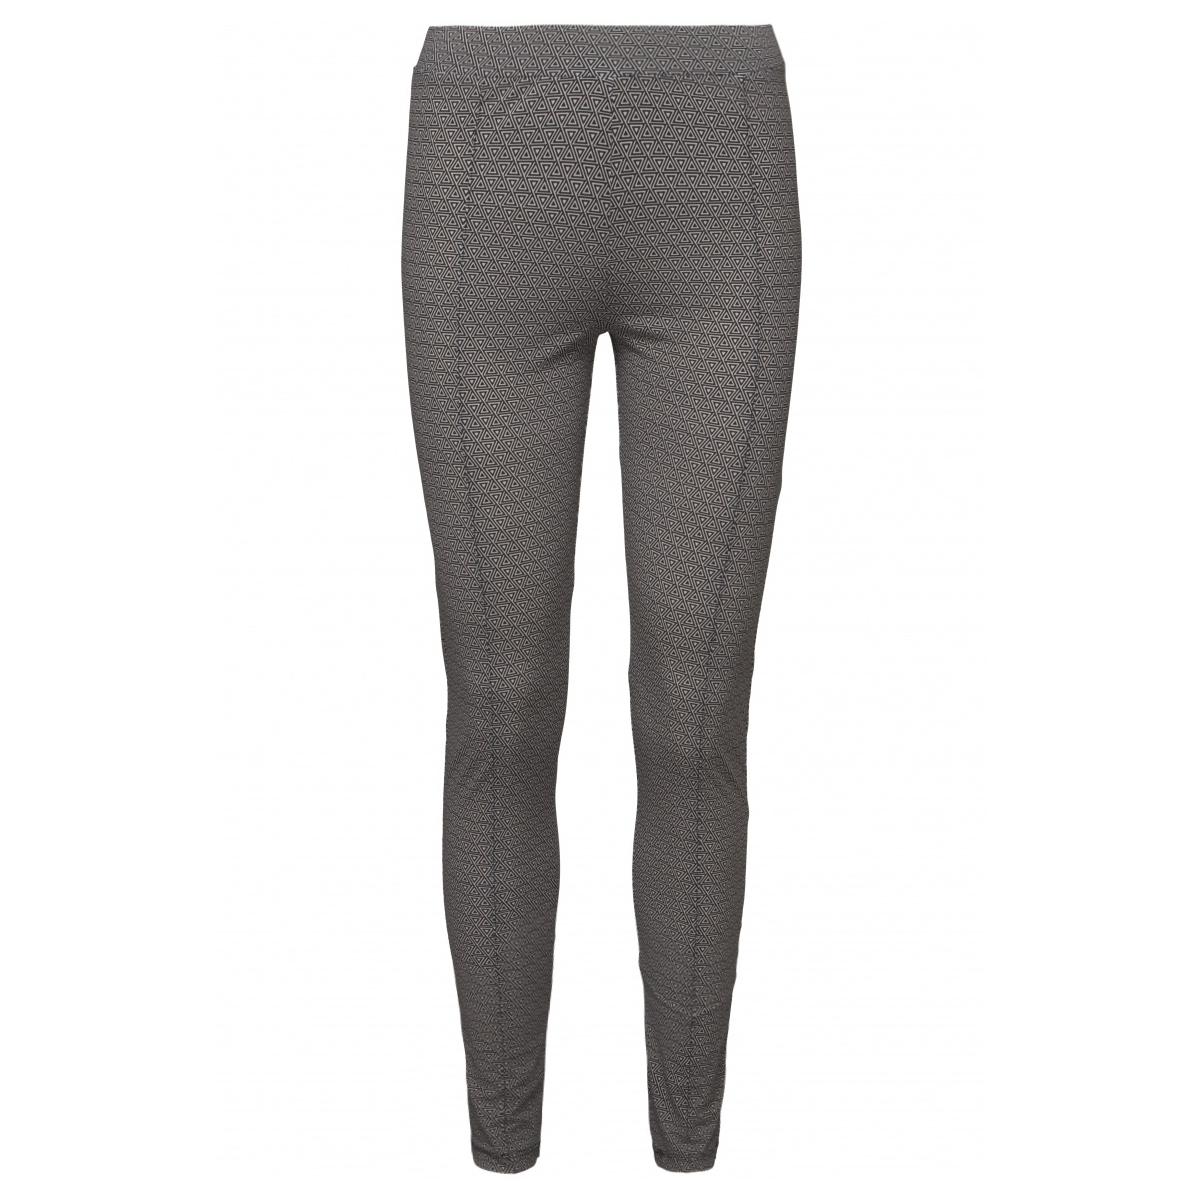 allison travel tight pant 201 zoso legging 0021 black/kit